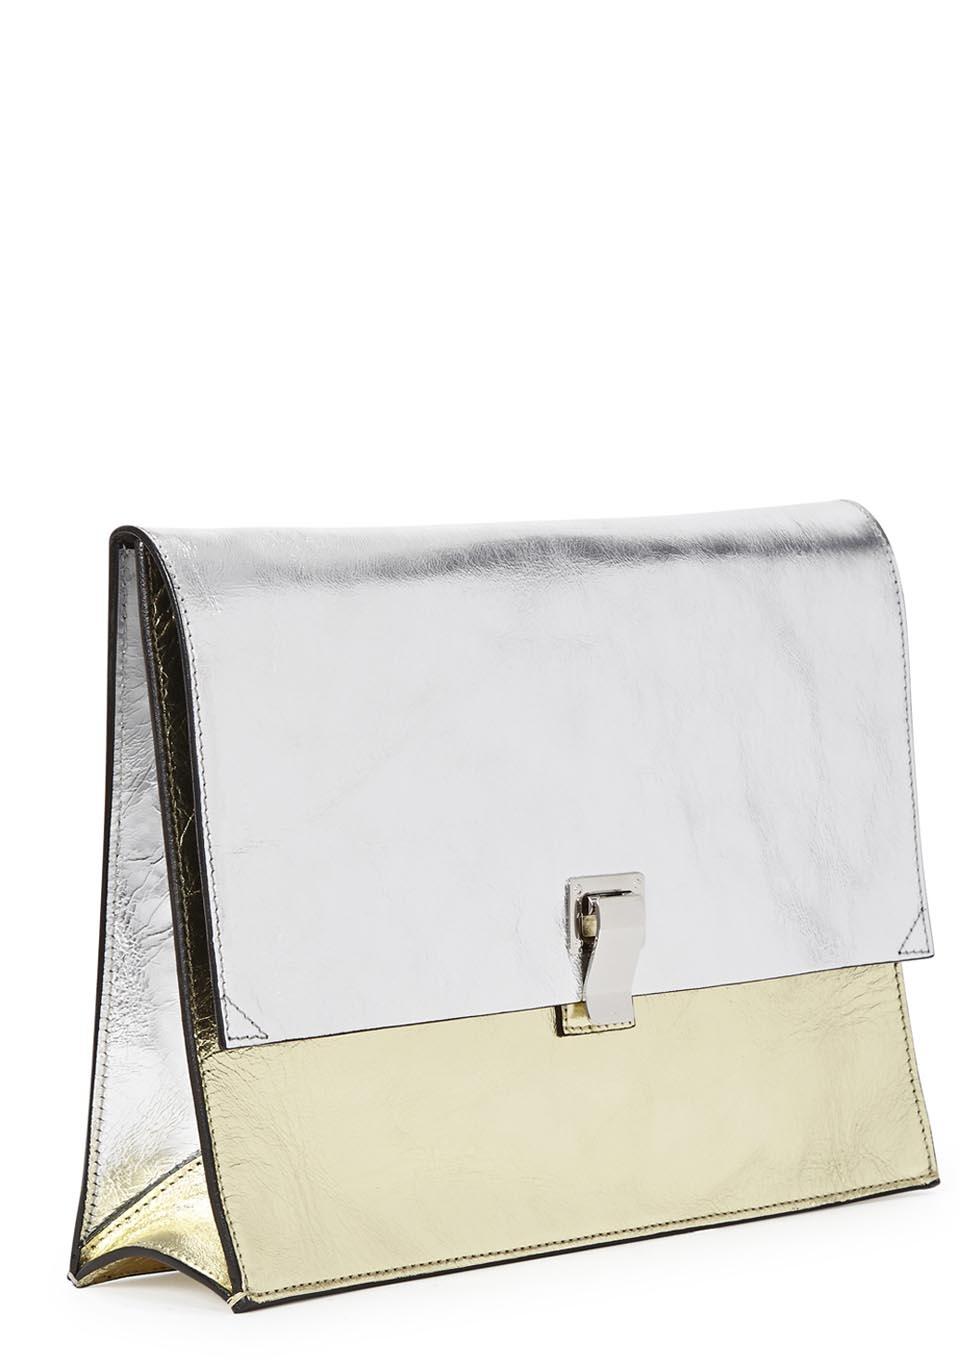 Proenza schouler lunch bag silver and gold leather clutch jpg 980x1372  Silver and gold leather handbags 1bbaec53da0e1